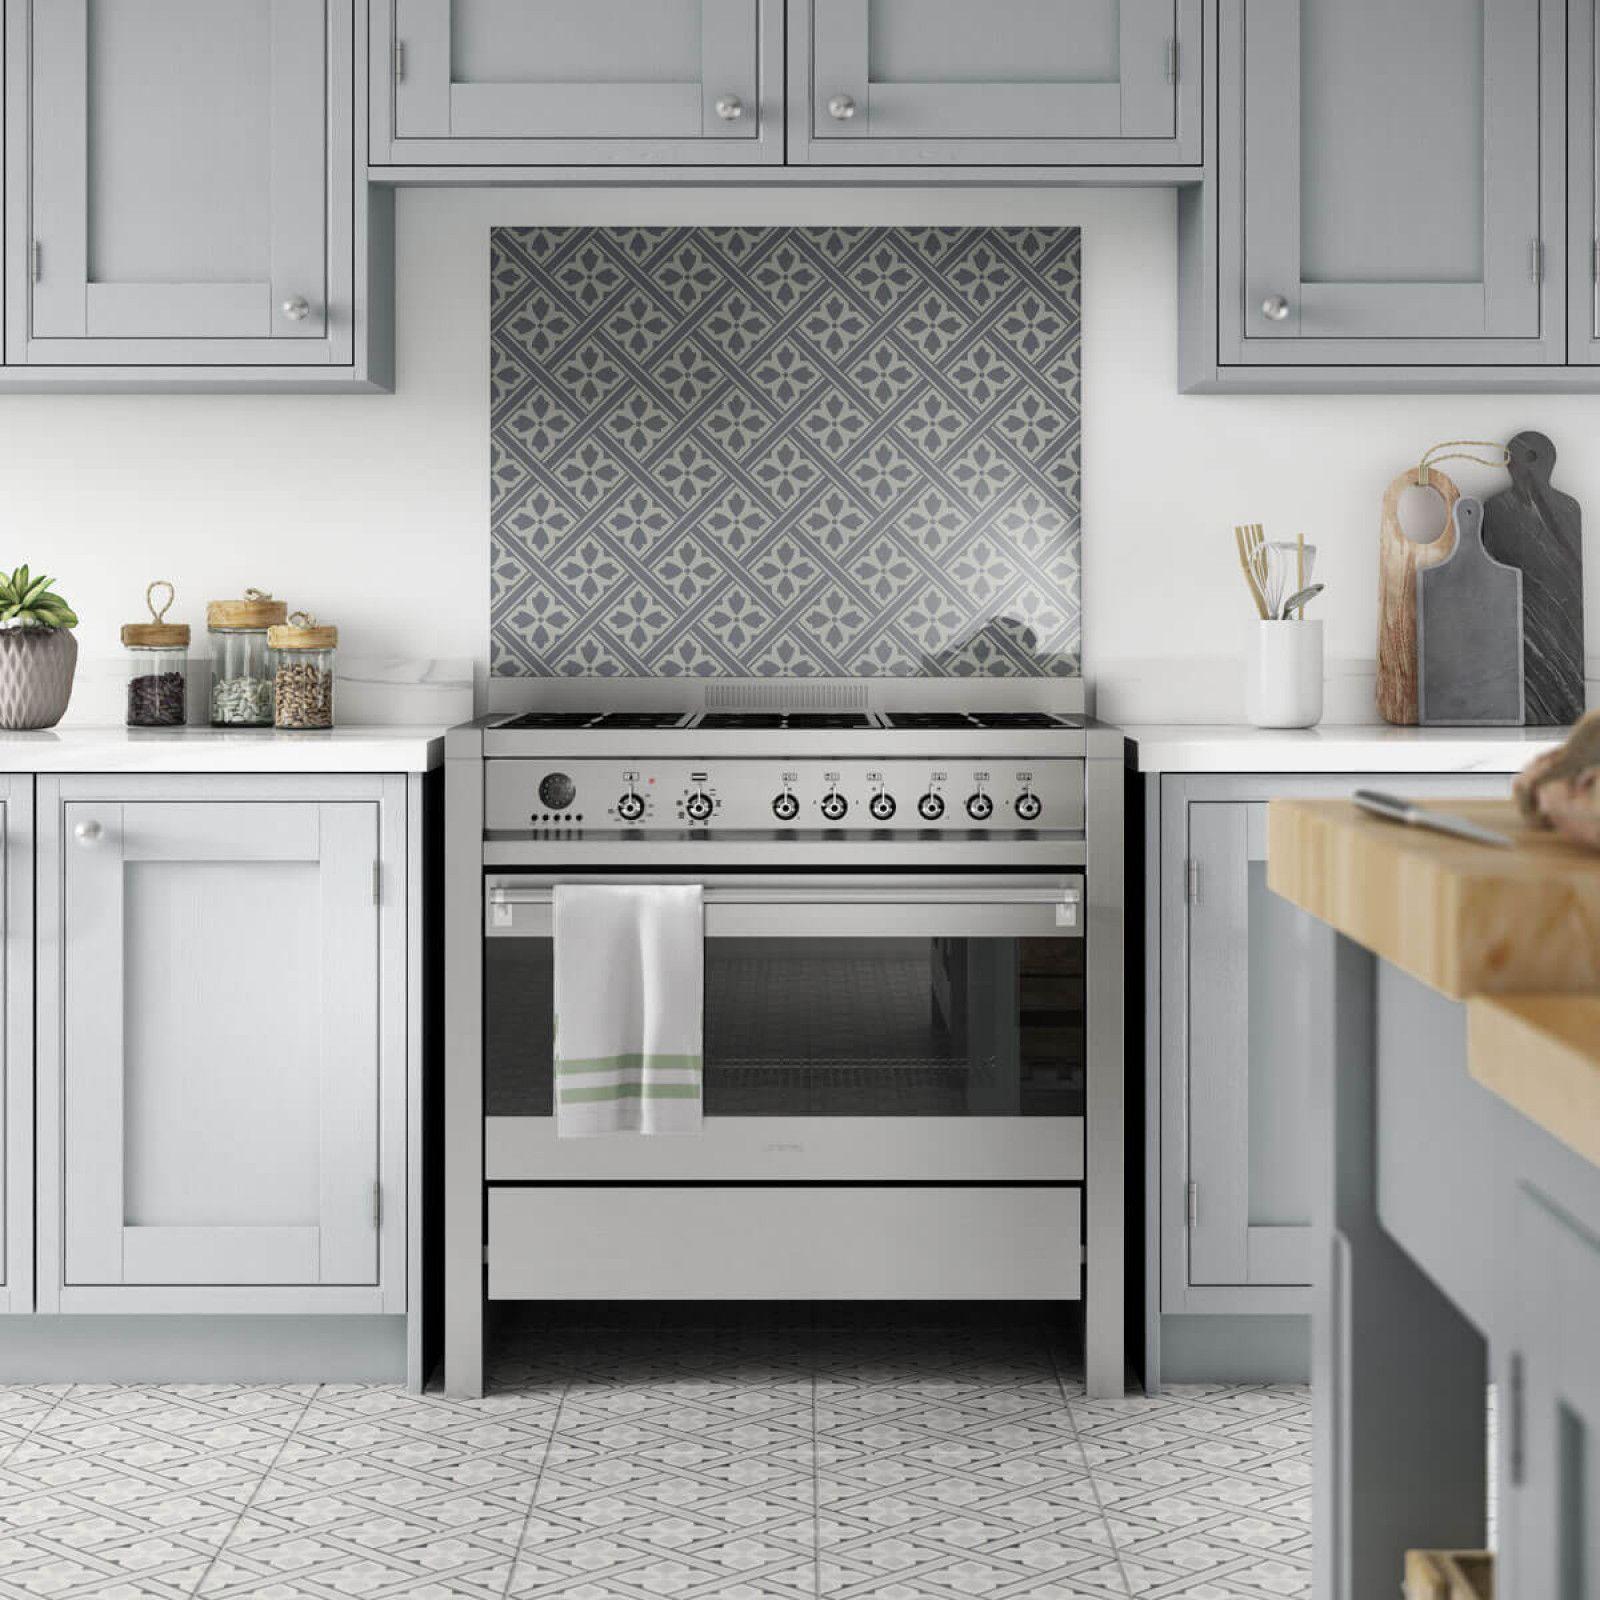 Uniquely Awesome Kitchen Splashback Ideas. get ideas at https   cbf-fund ed20a995e